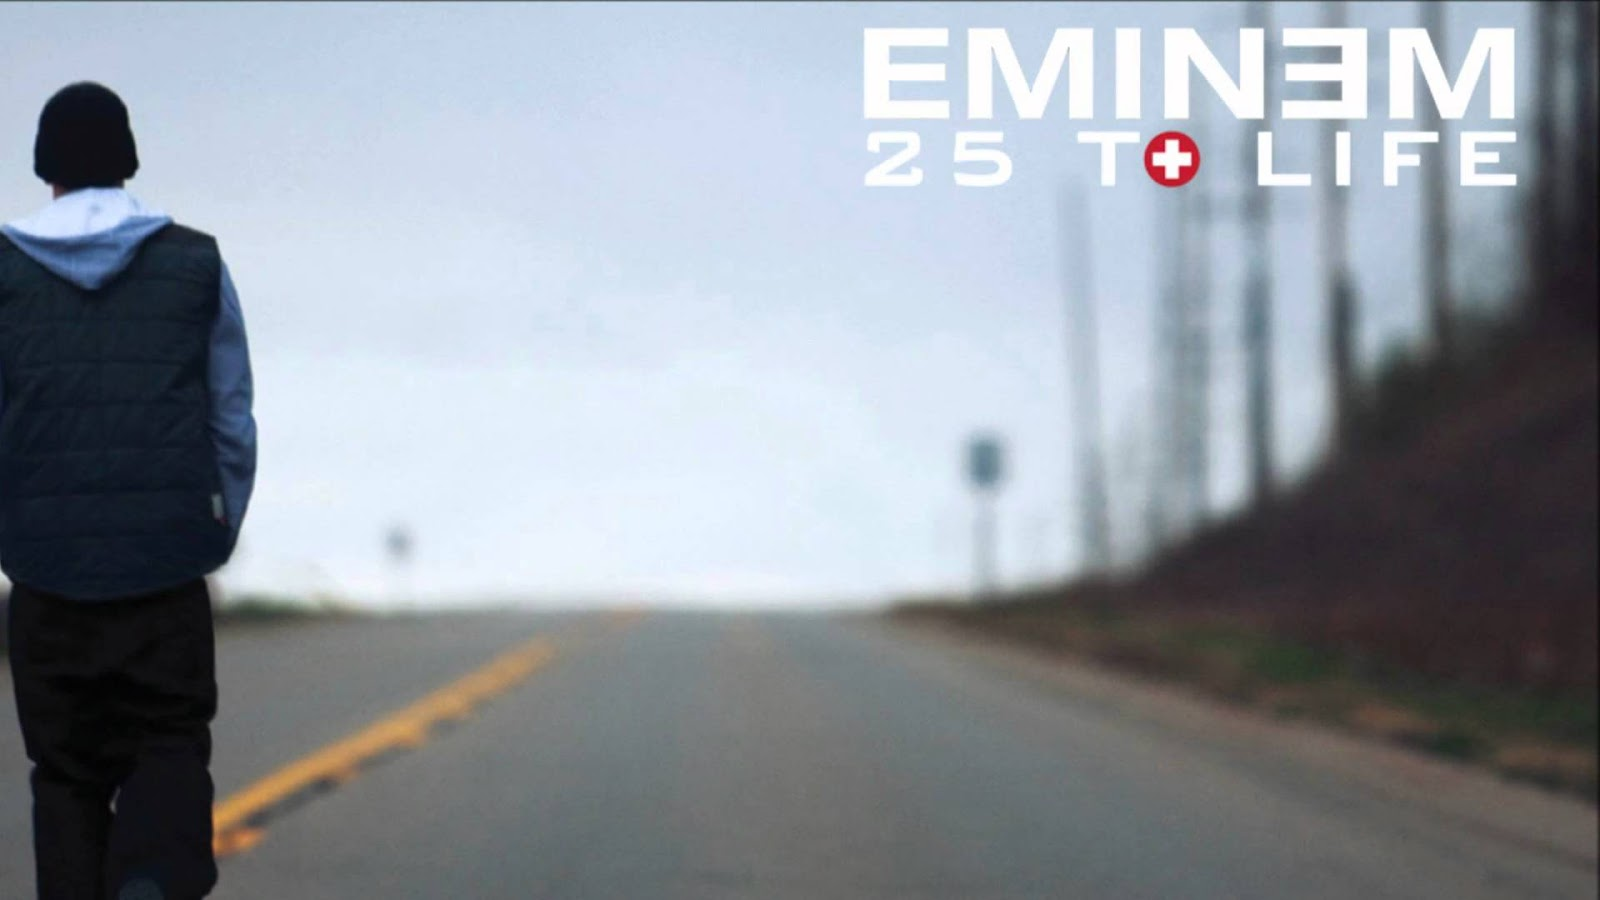 Talkin' 2 Myself (feat. Kobe Honeycutt) - Eminem: Testo (lyrics), traduzione e video